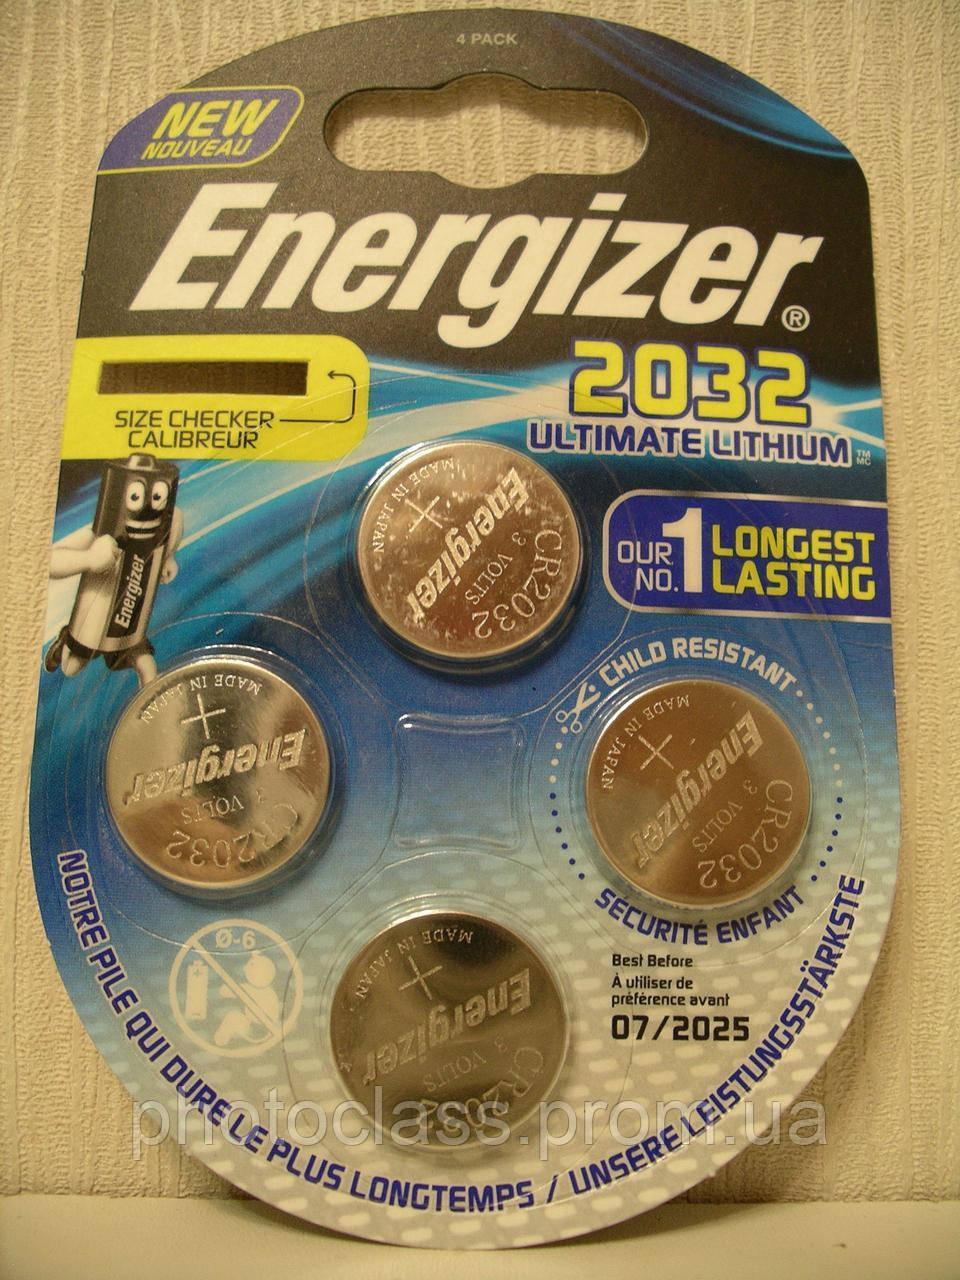 Energizer Ultimate Lithium 2032 батарейка (4 штуки)